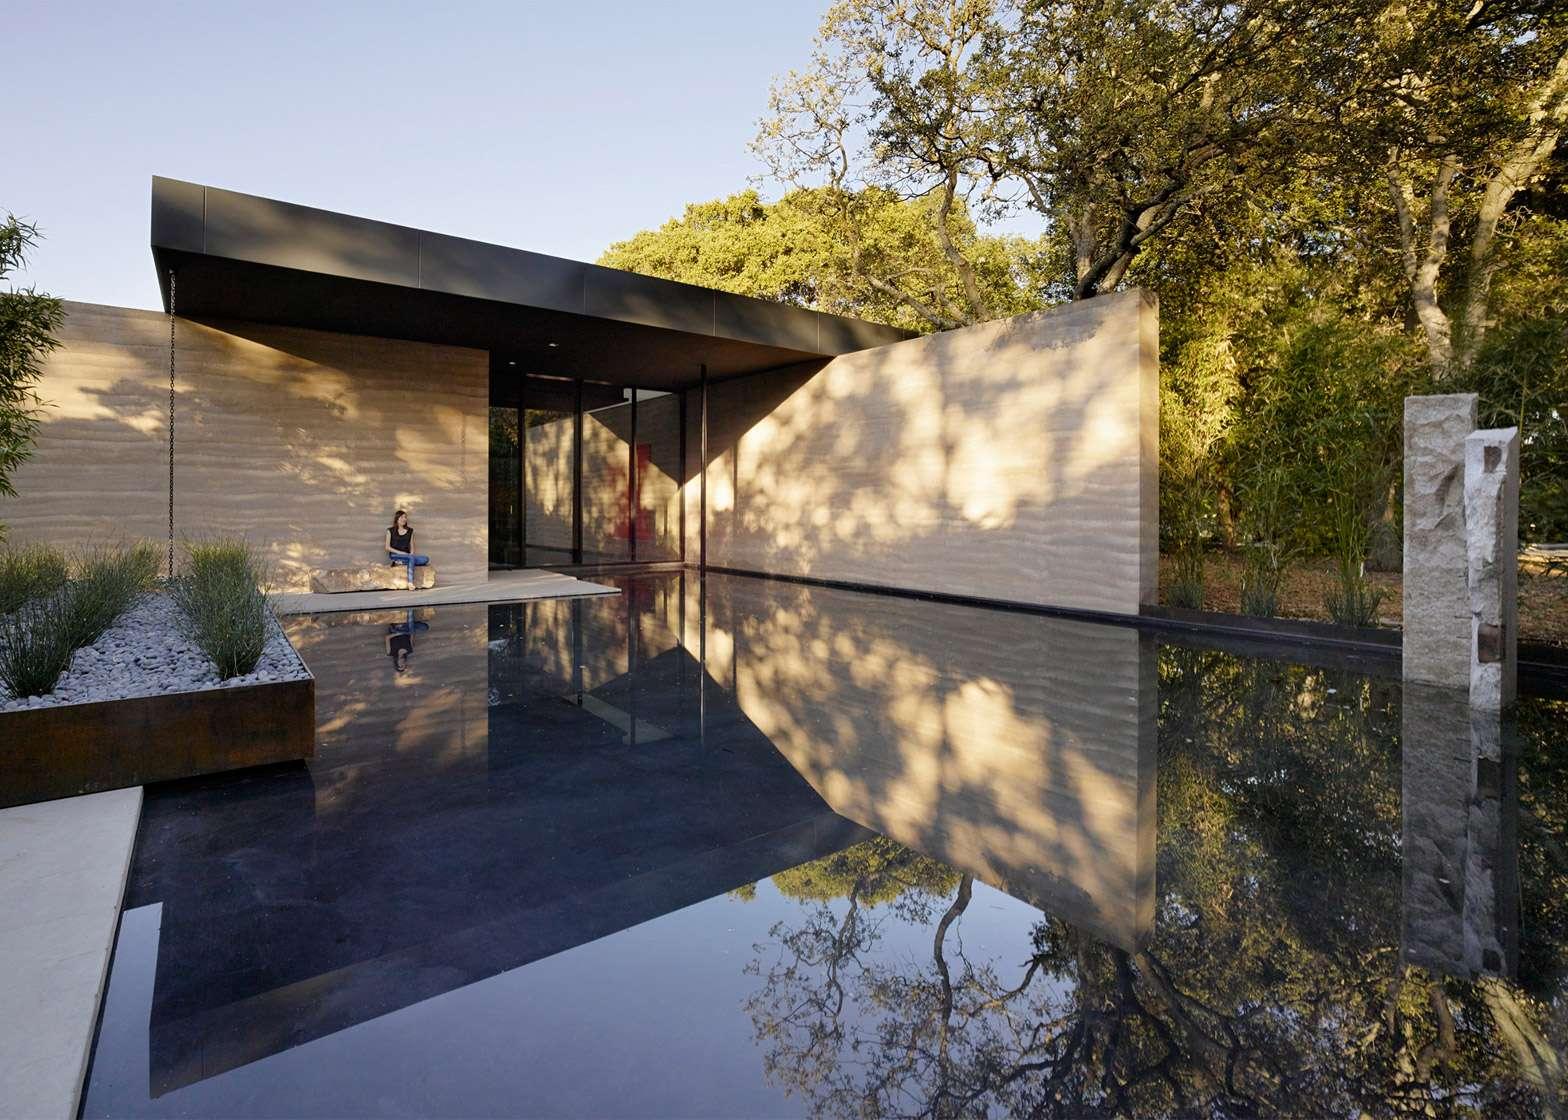 Centrum medytacji na Uniwersytecie Stanforda projektu Aidlin Darlin